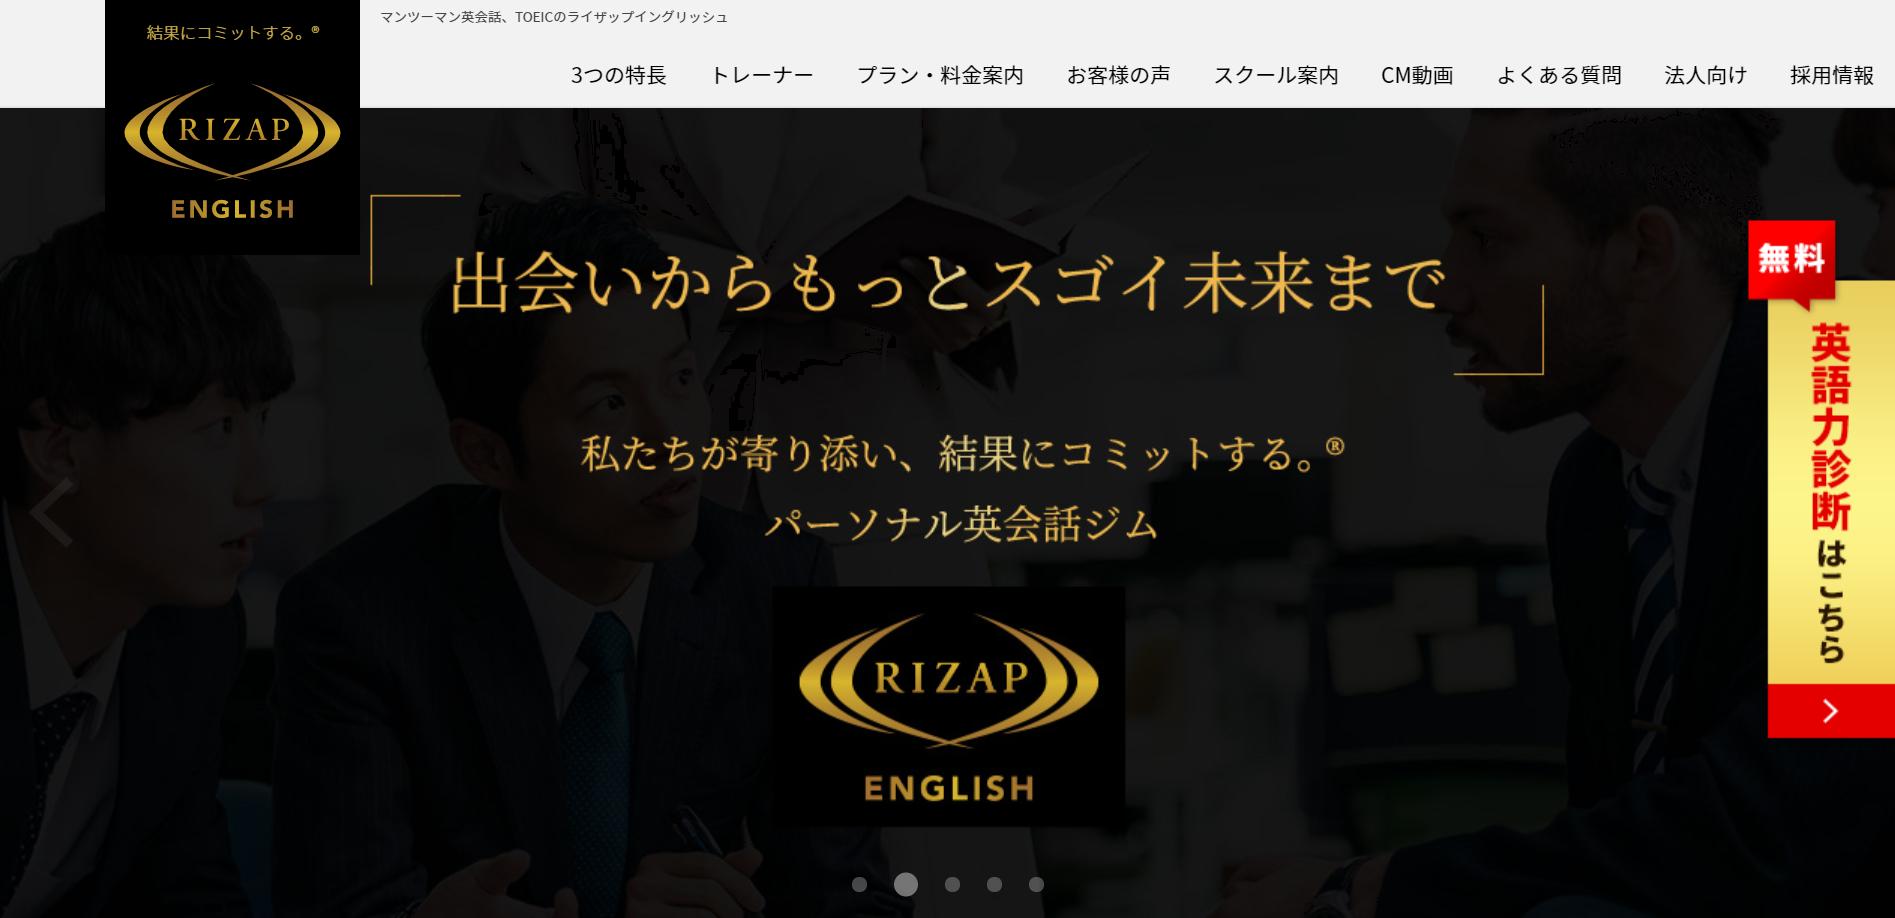 rizap_english